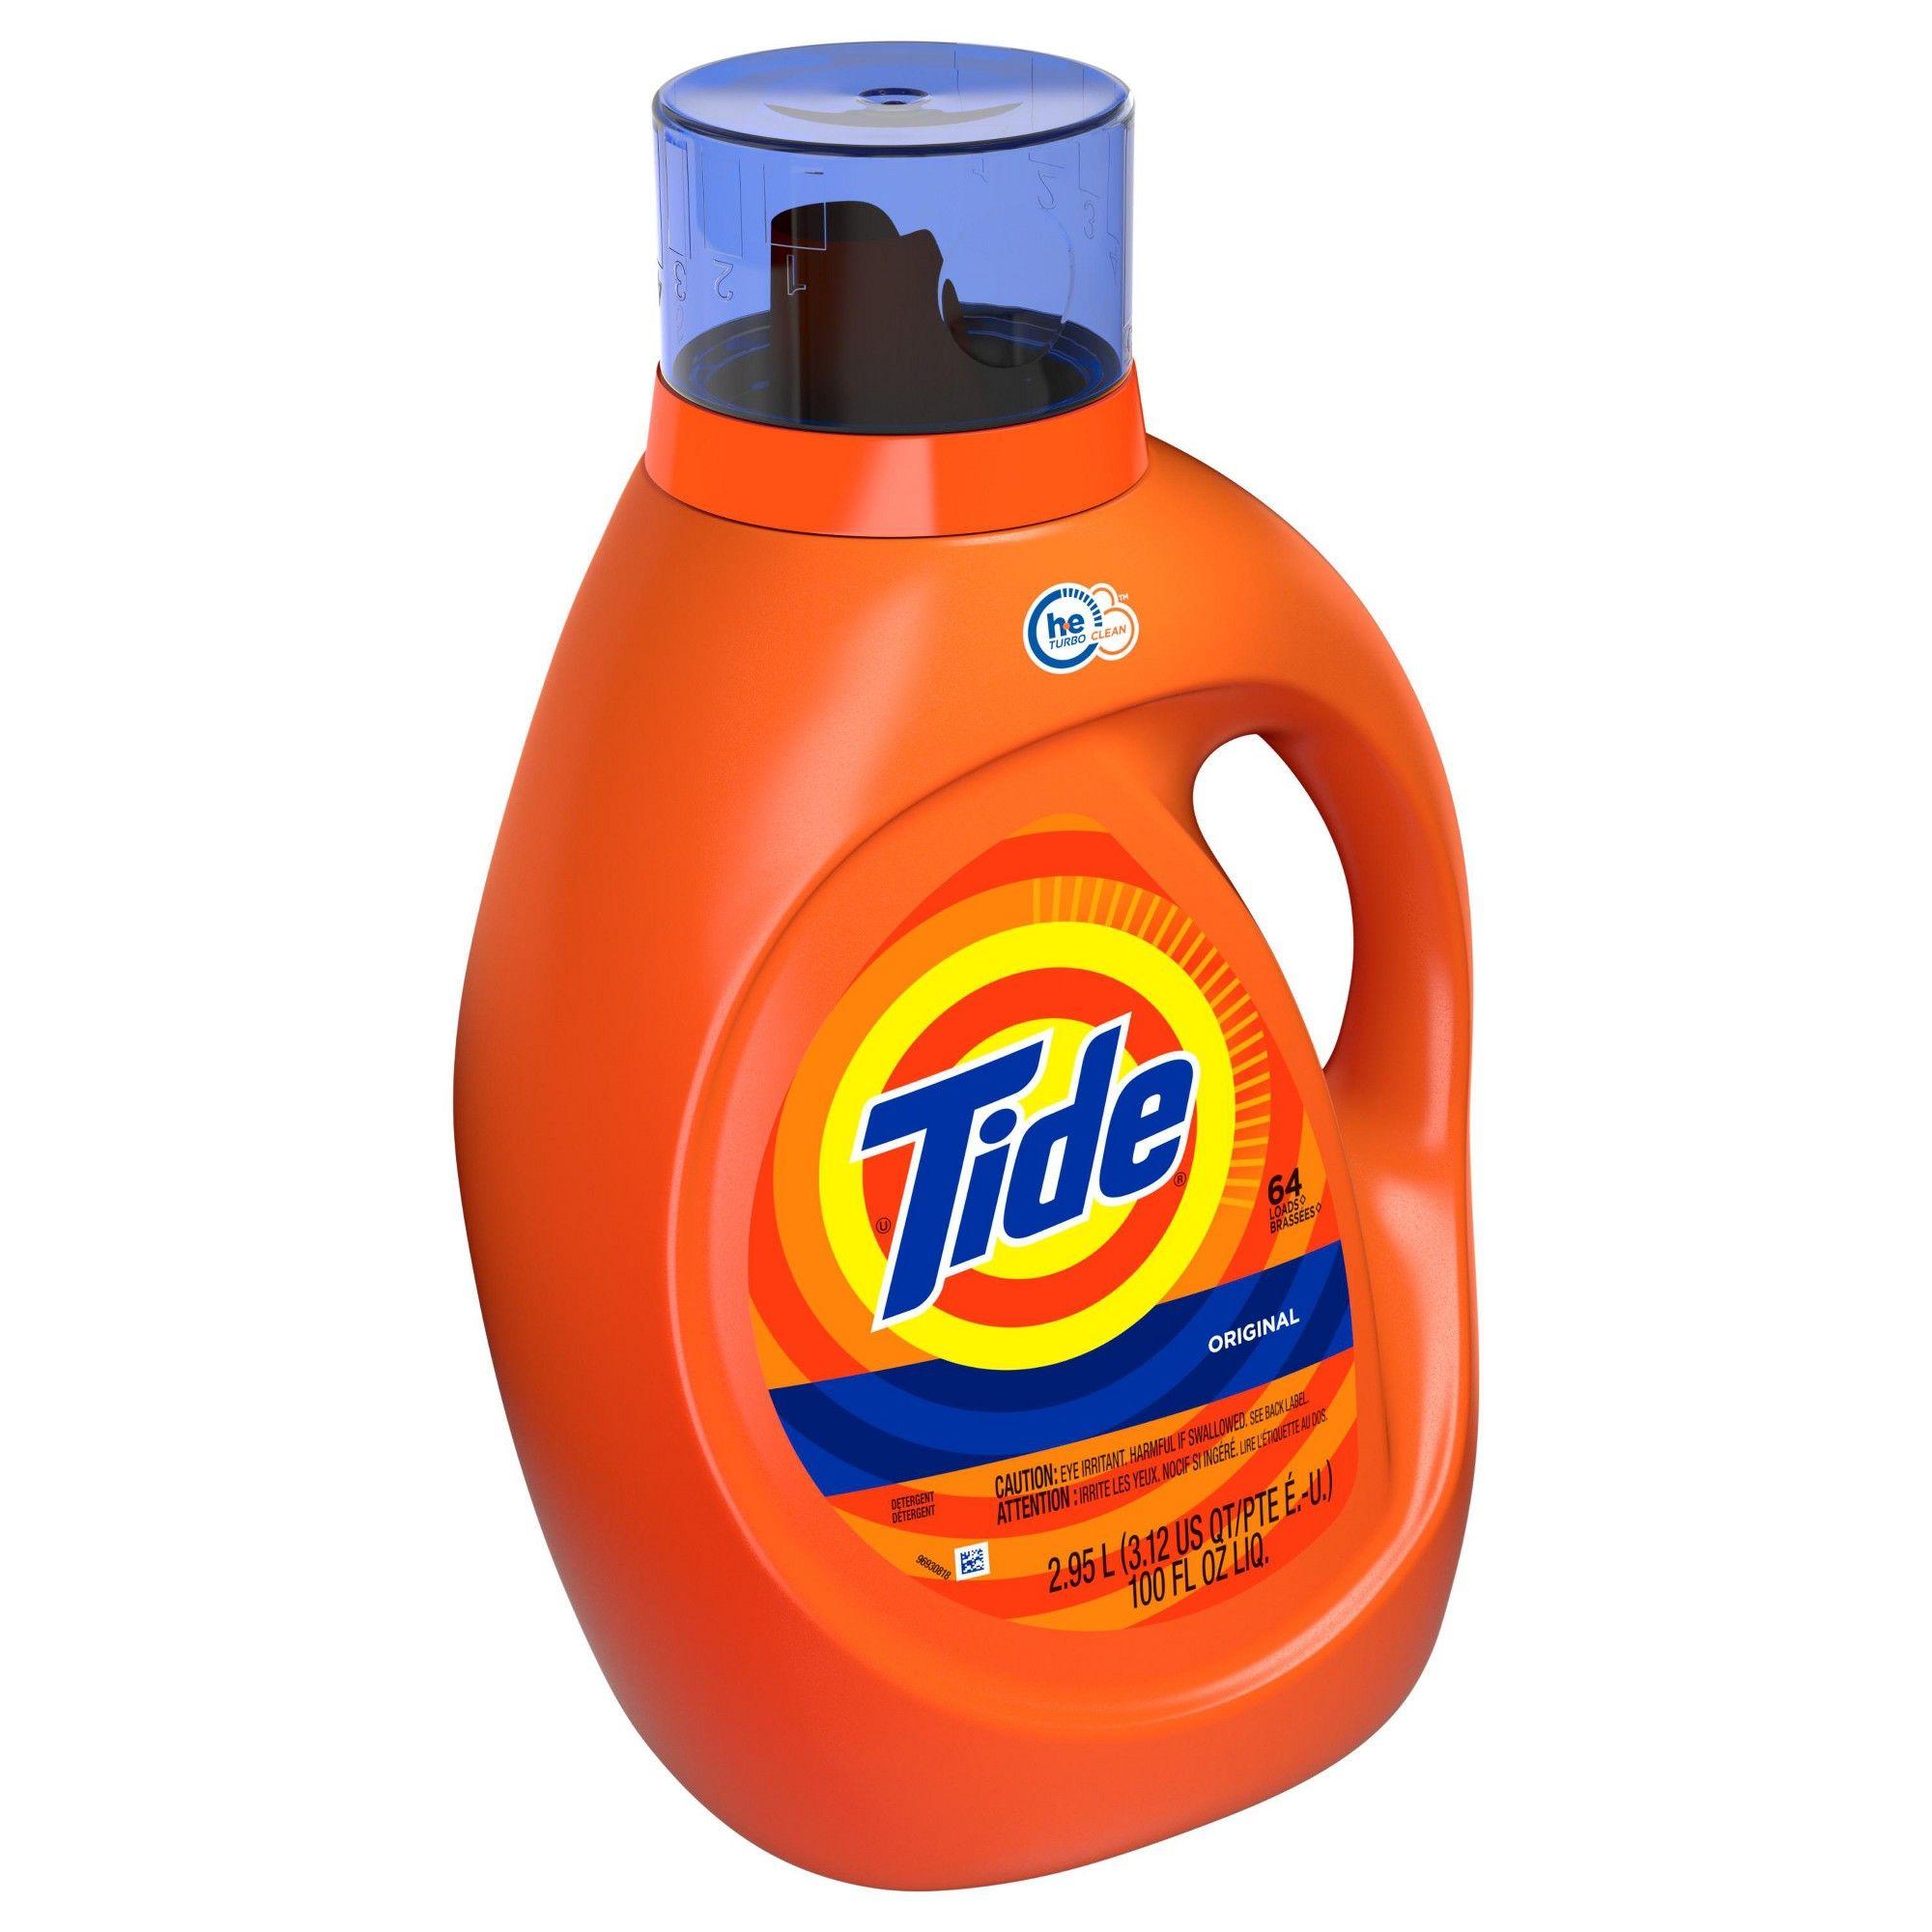 Tide Original He Liquid Laundry Detergent 92 Fl Oz Laundry